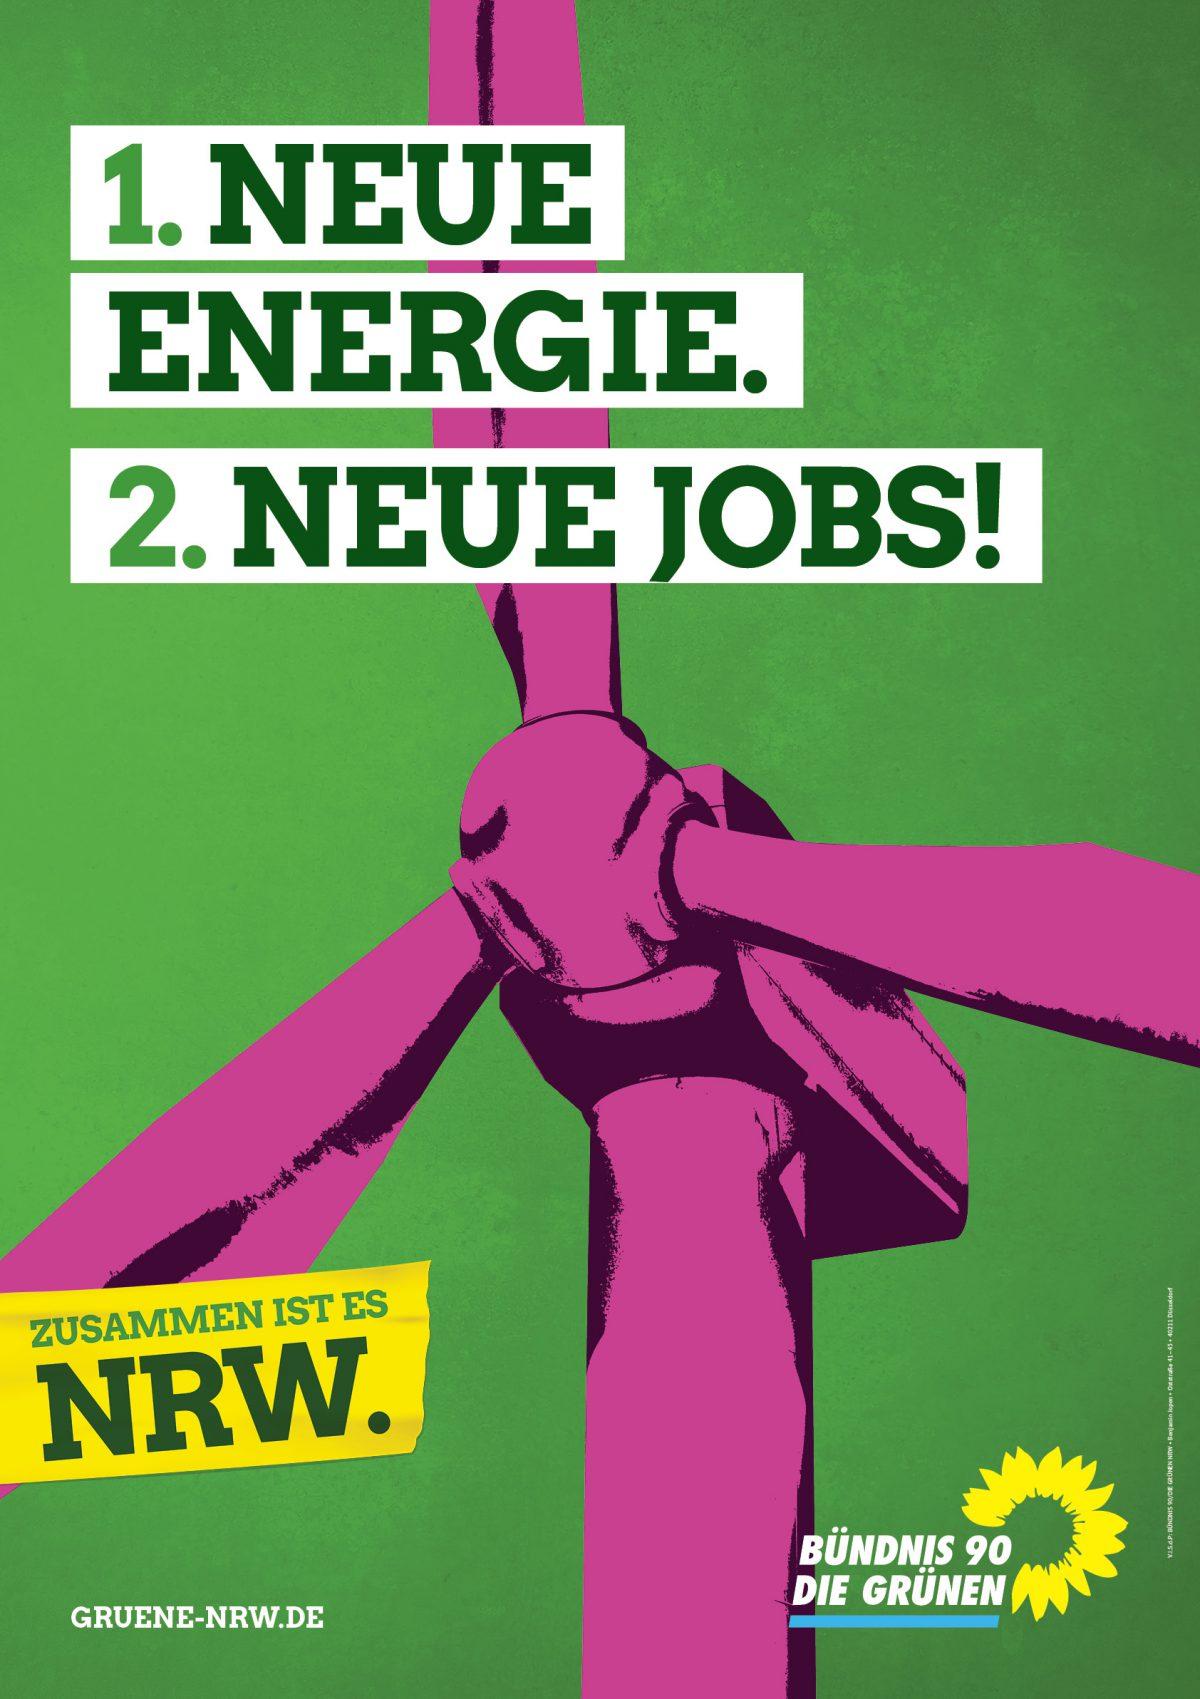 Die Grünen Wahlplakat